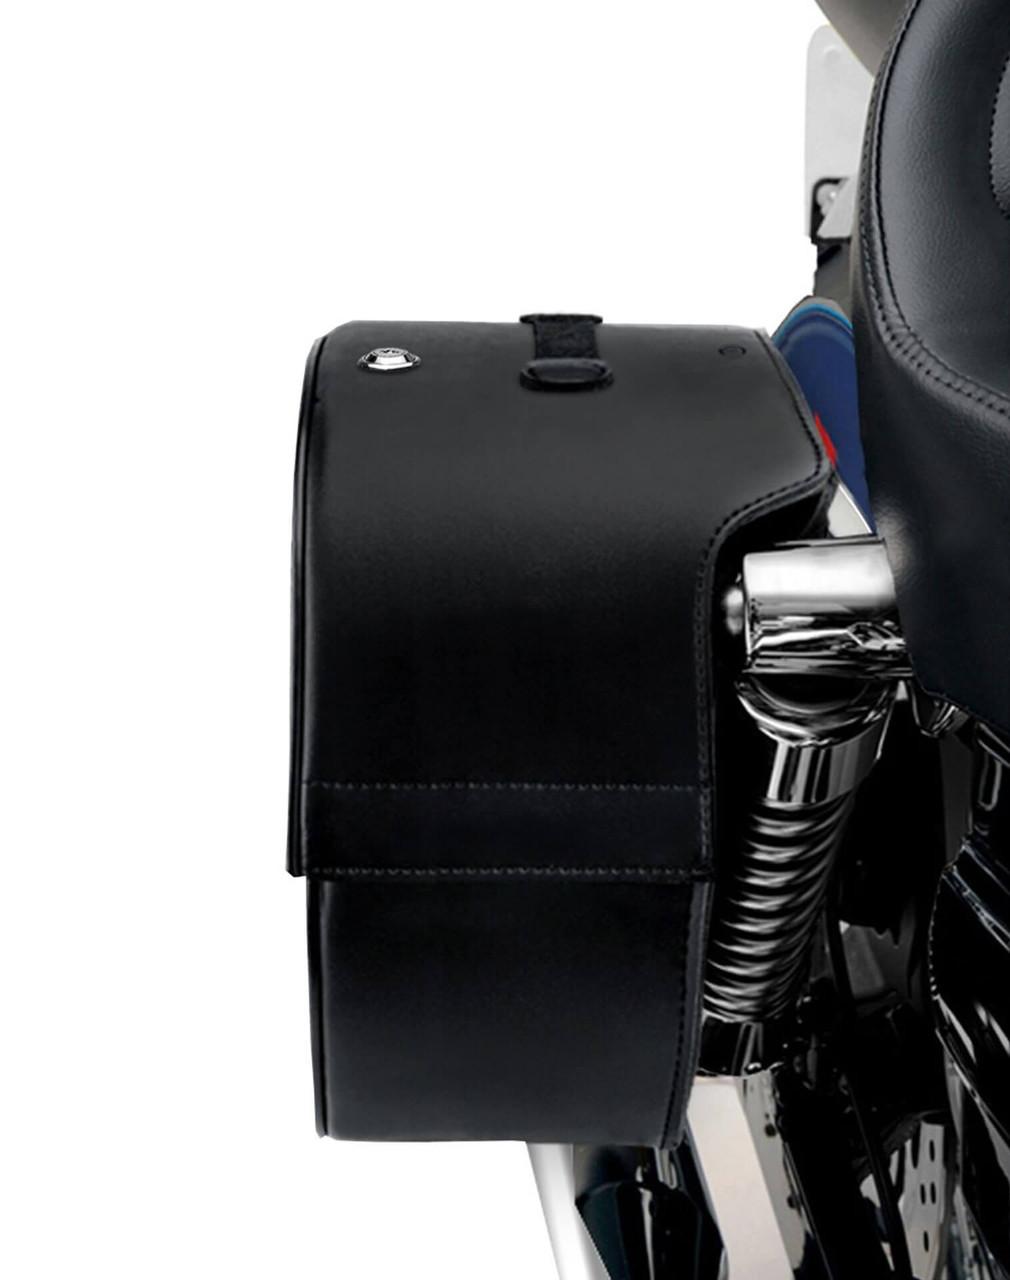 Honda VTX 1300 C Spear Shock Cutout Studded Motorcycle Saddlebags Shock Cutout View